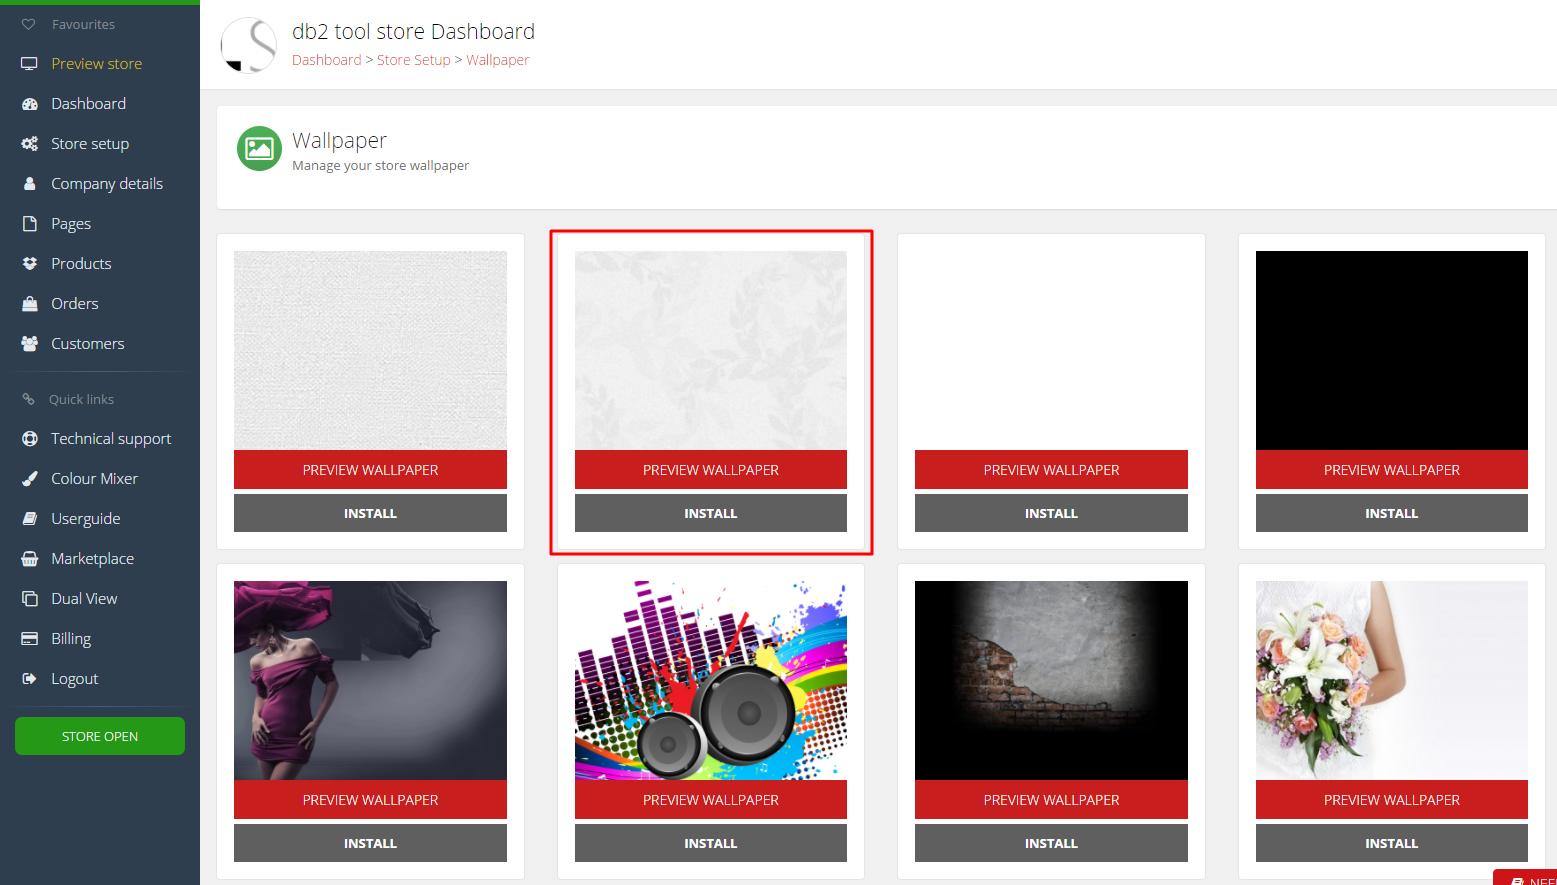 Dashboard2 0 Userguide > #11 > Install a new wallpaper